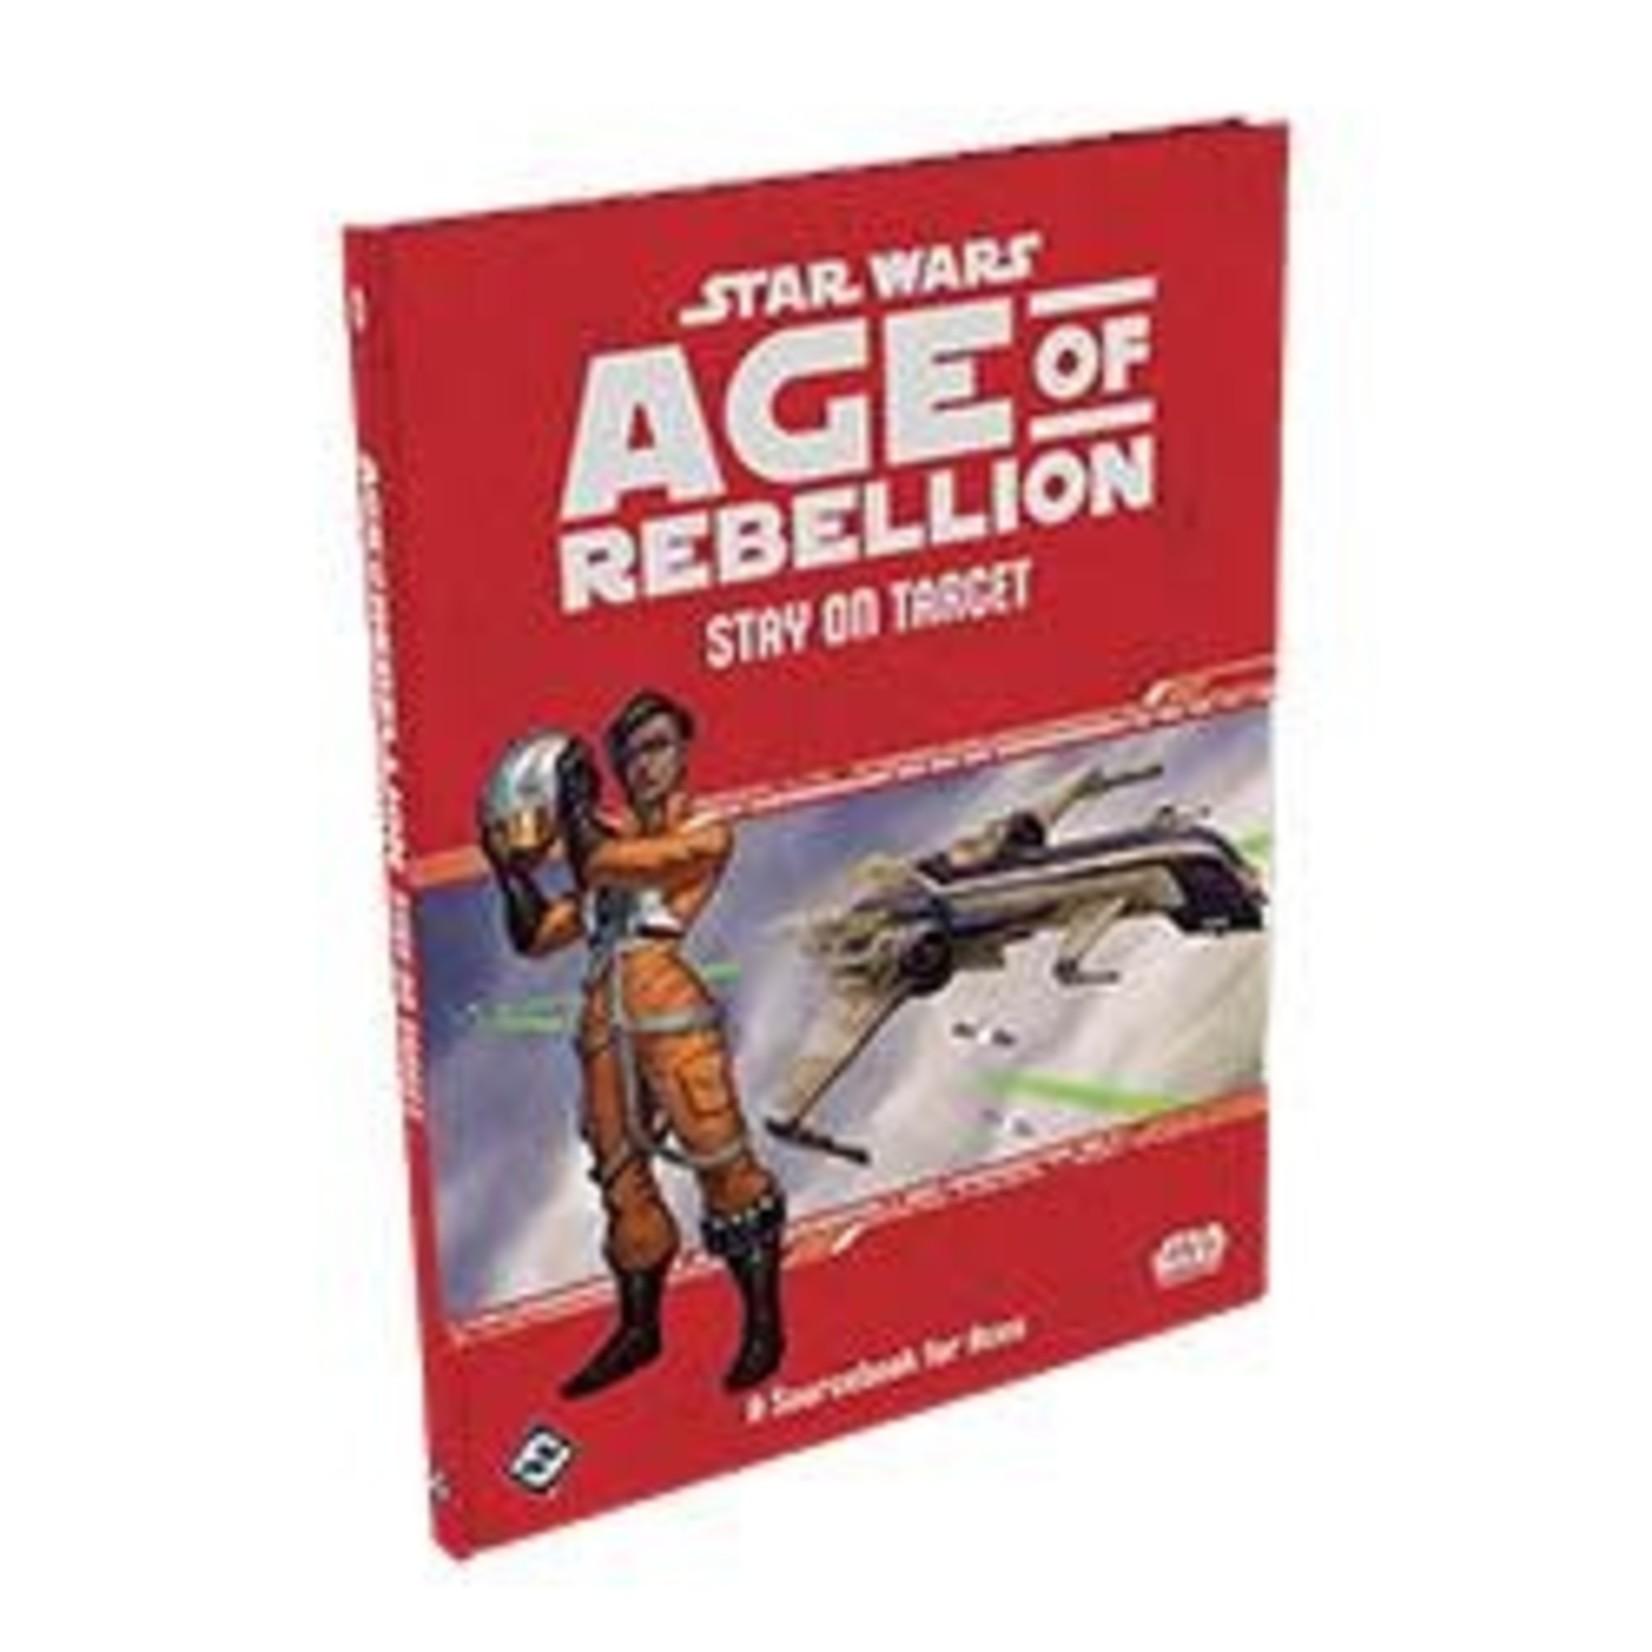 Fantasy Flight Games Star Wars RPG: Age of Rebellion - Stay on Target Hardcover